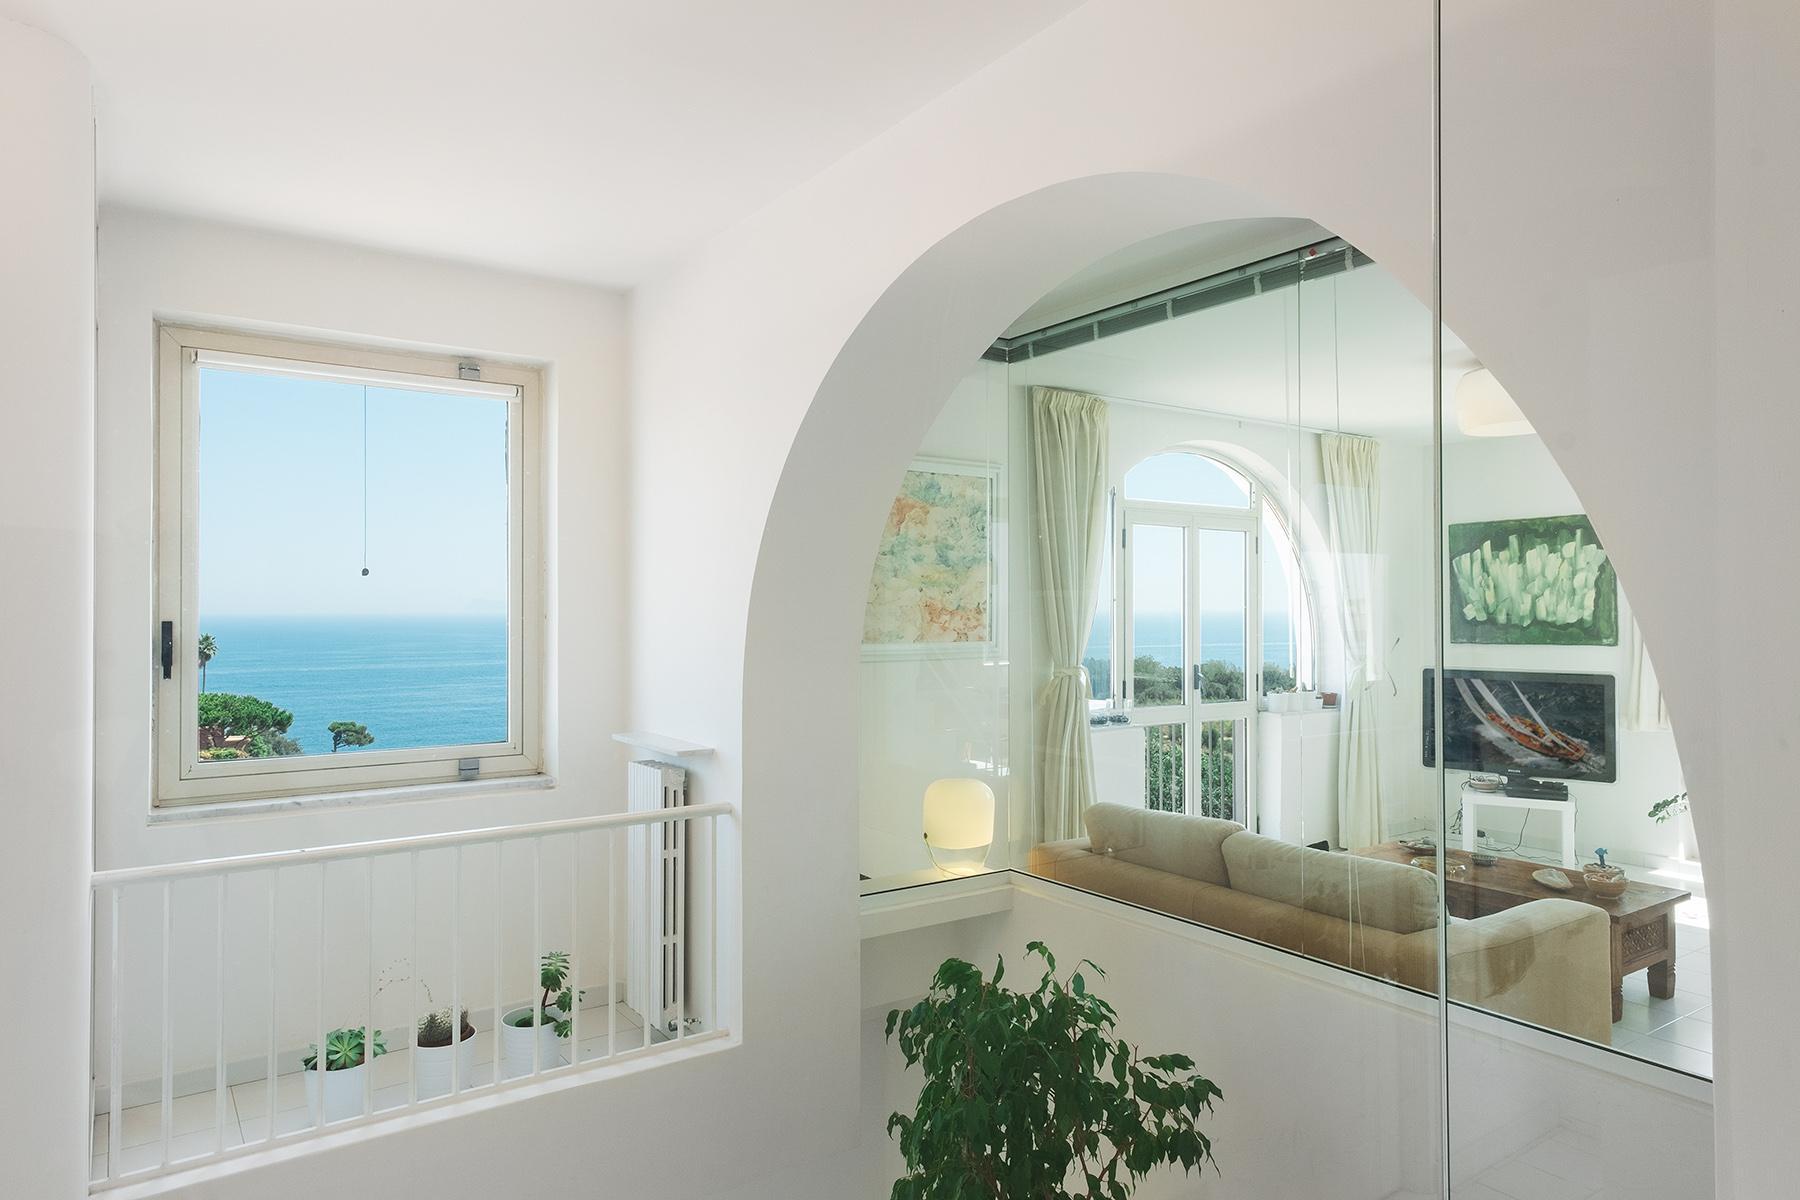 Magnificent property between sky and sea overlooking Naples - 10